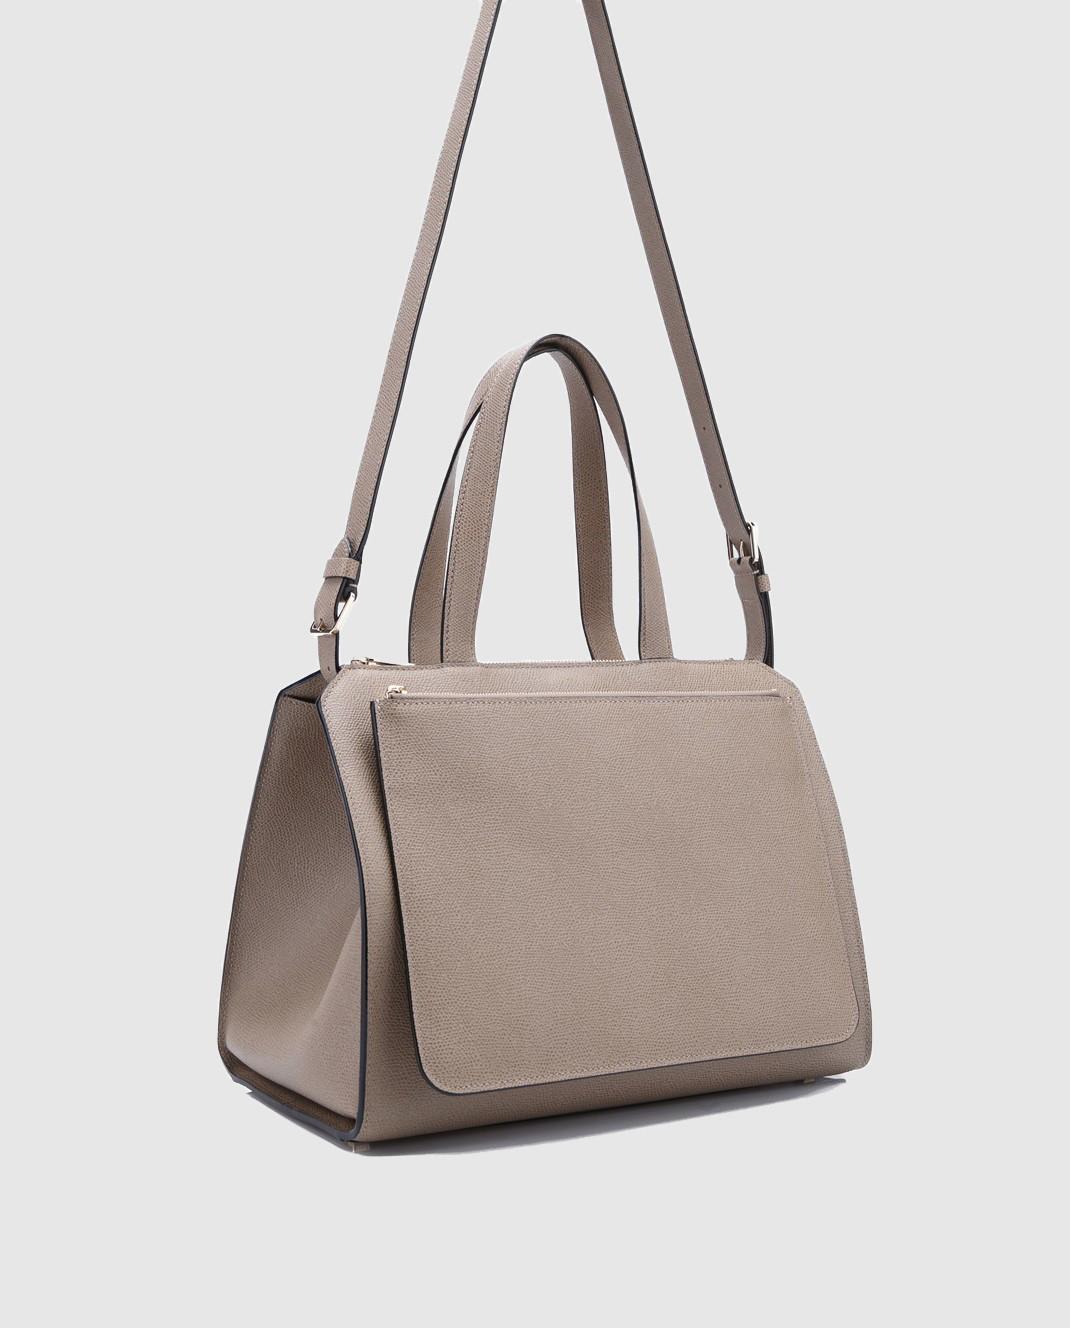 Valextra Бежевая сумка из кожи V5F31 изображение 3